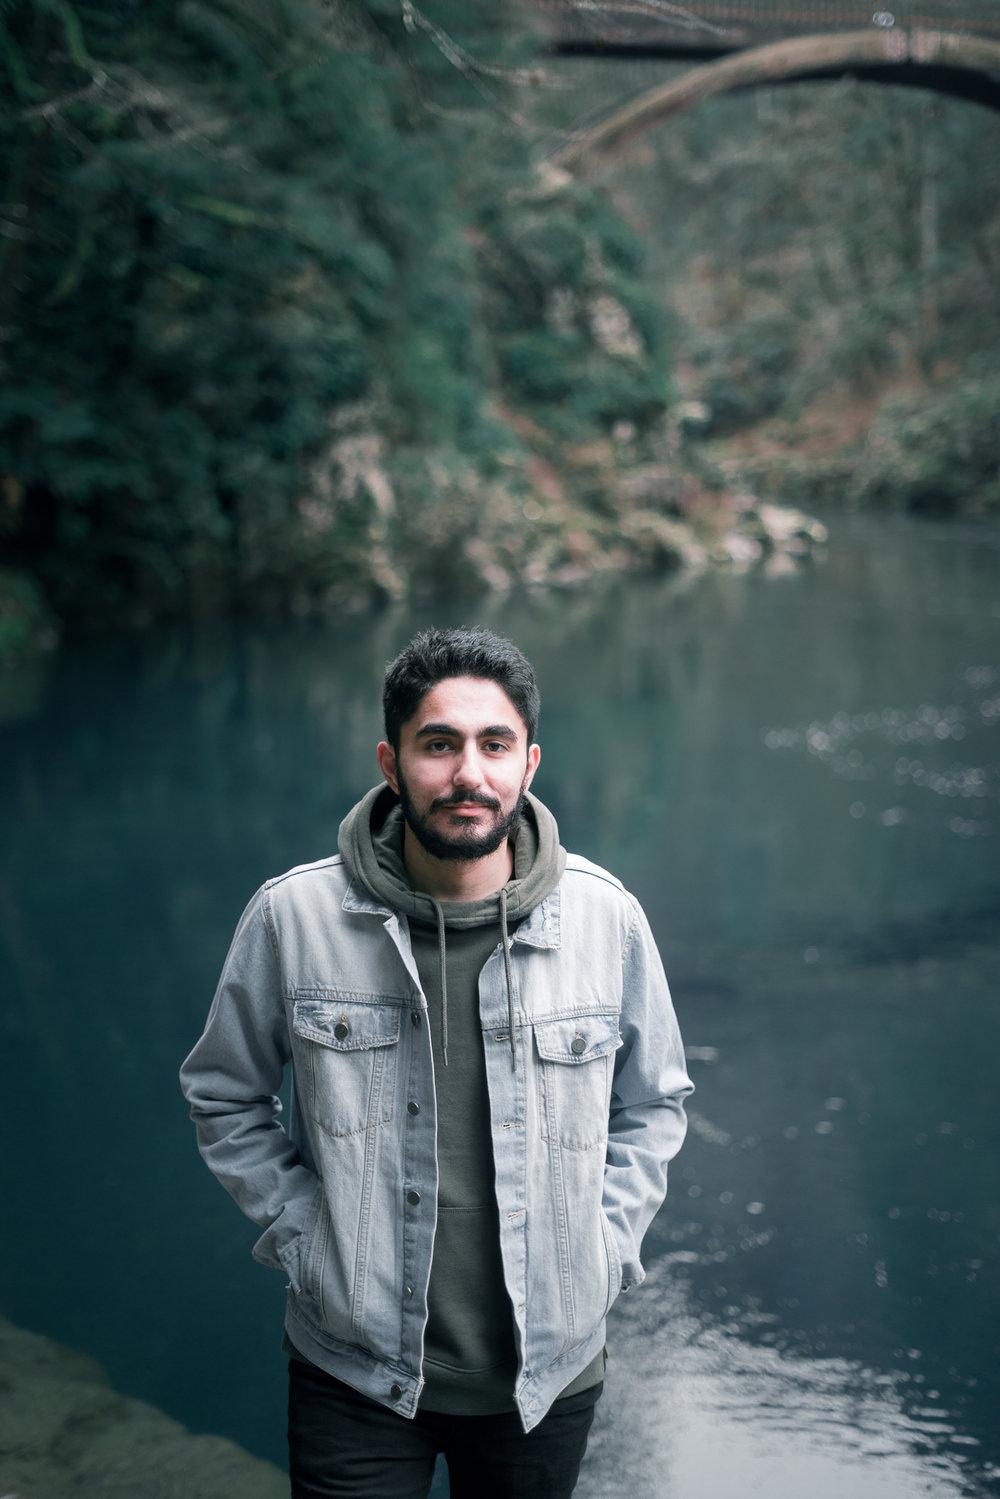 Photo by Haya Rawas // Edit by Tariq Abdellatif